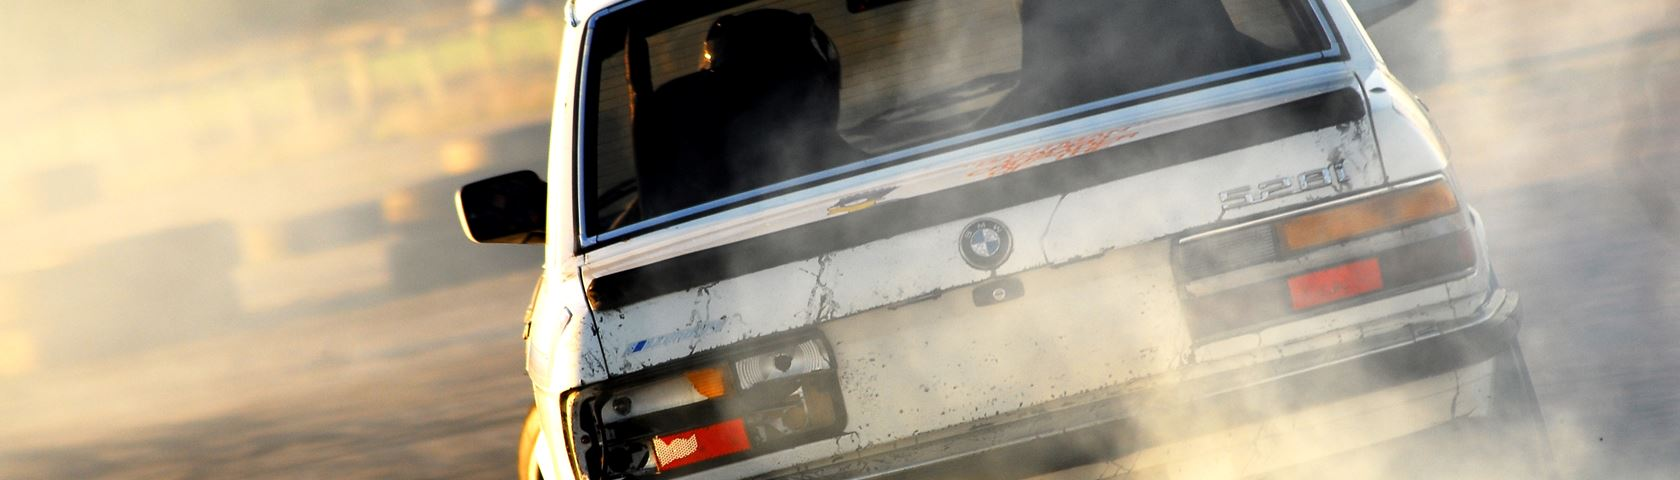 Drifting BMW 528i